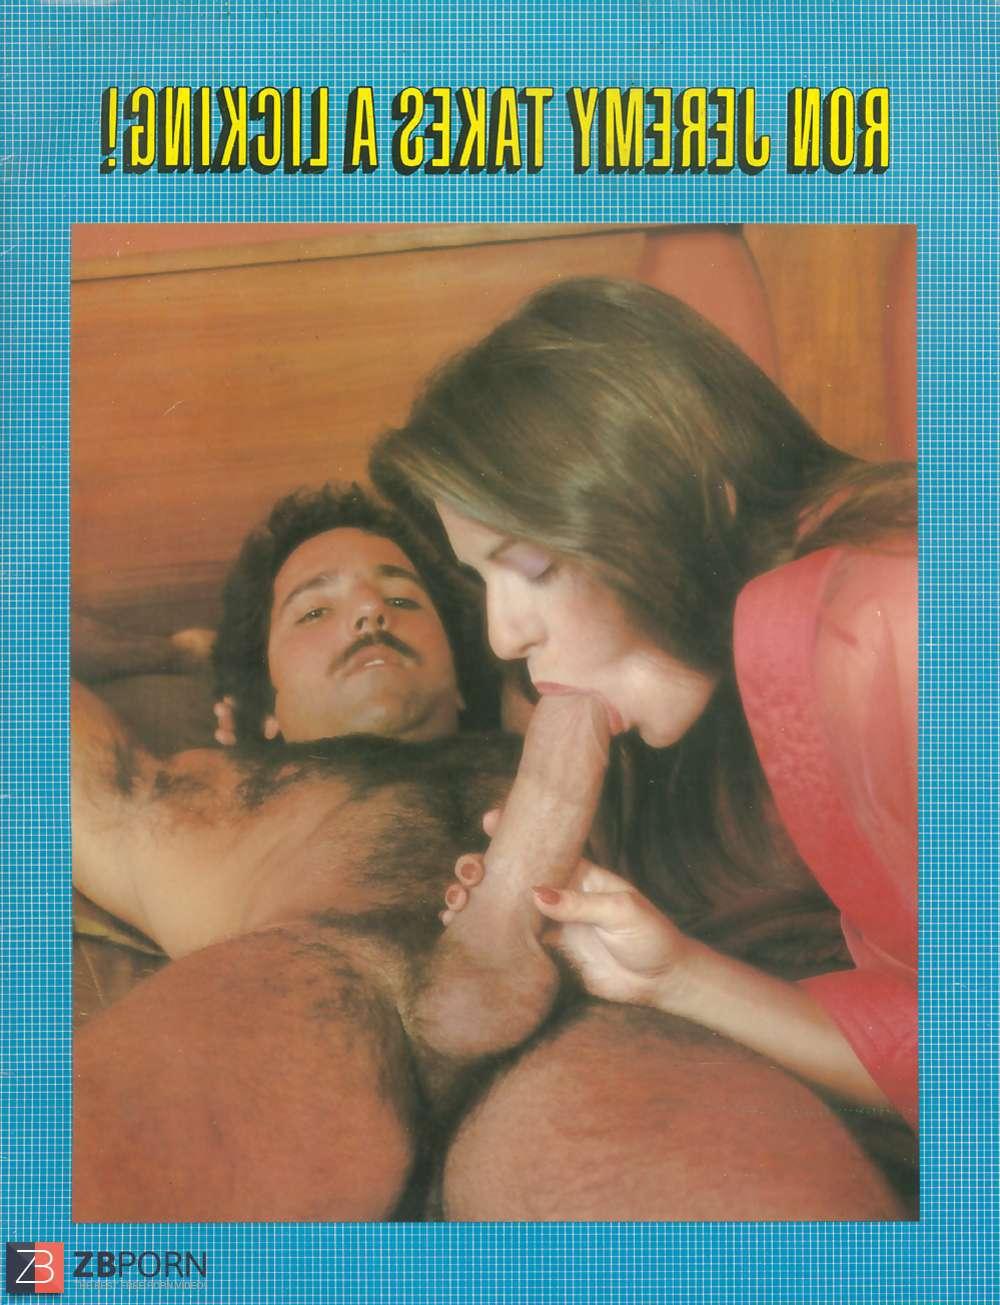 Vintage ron jeremy porn